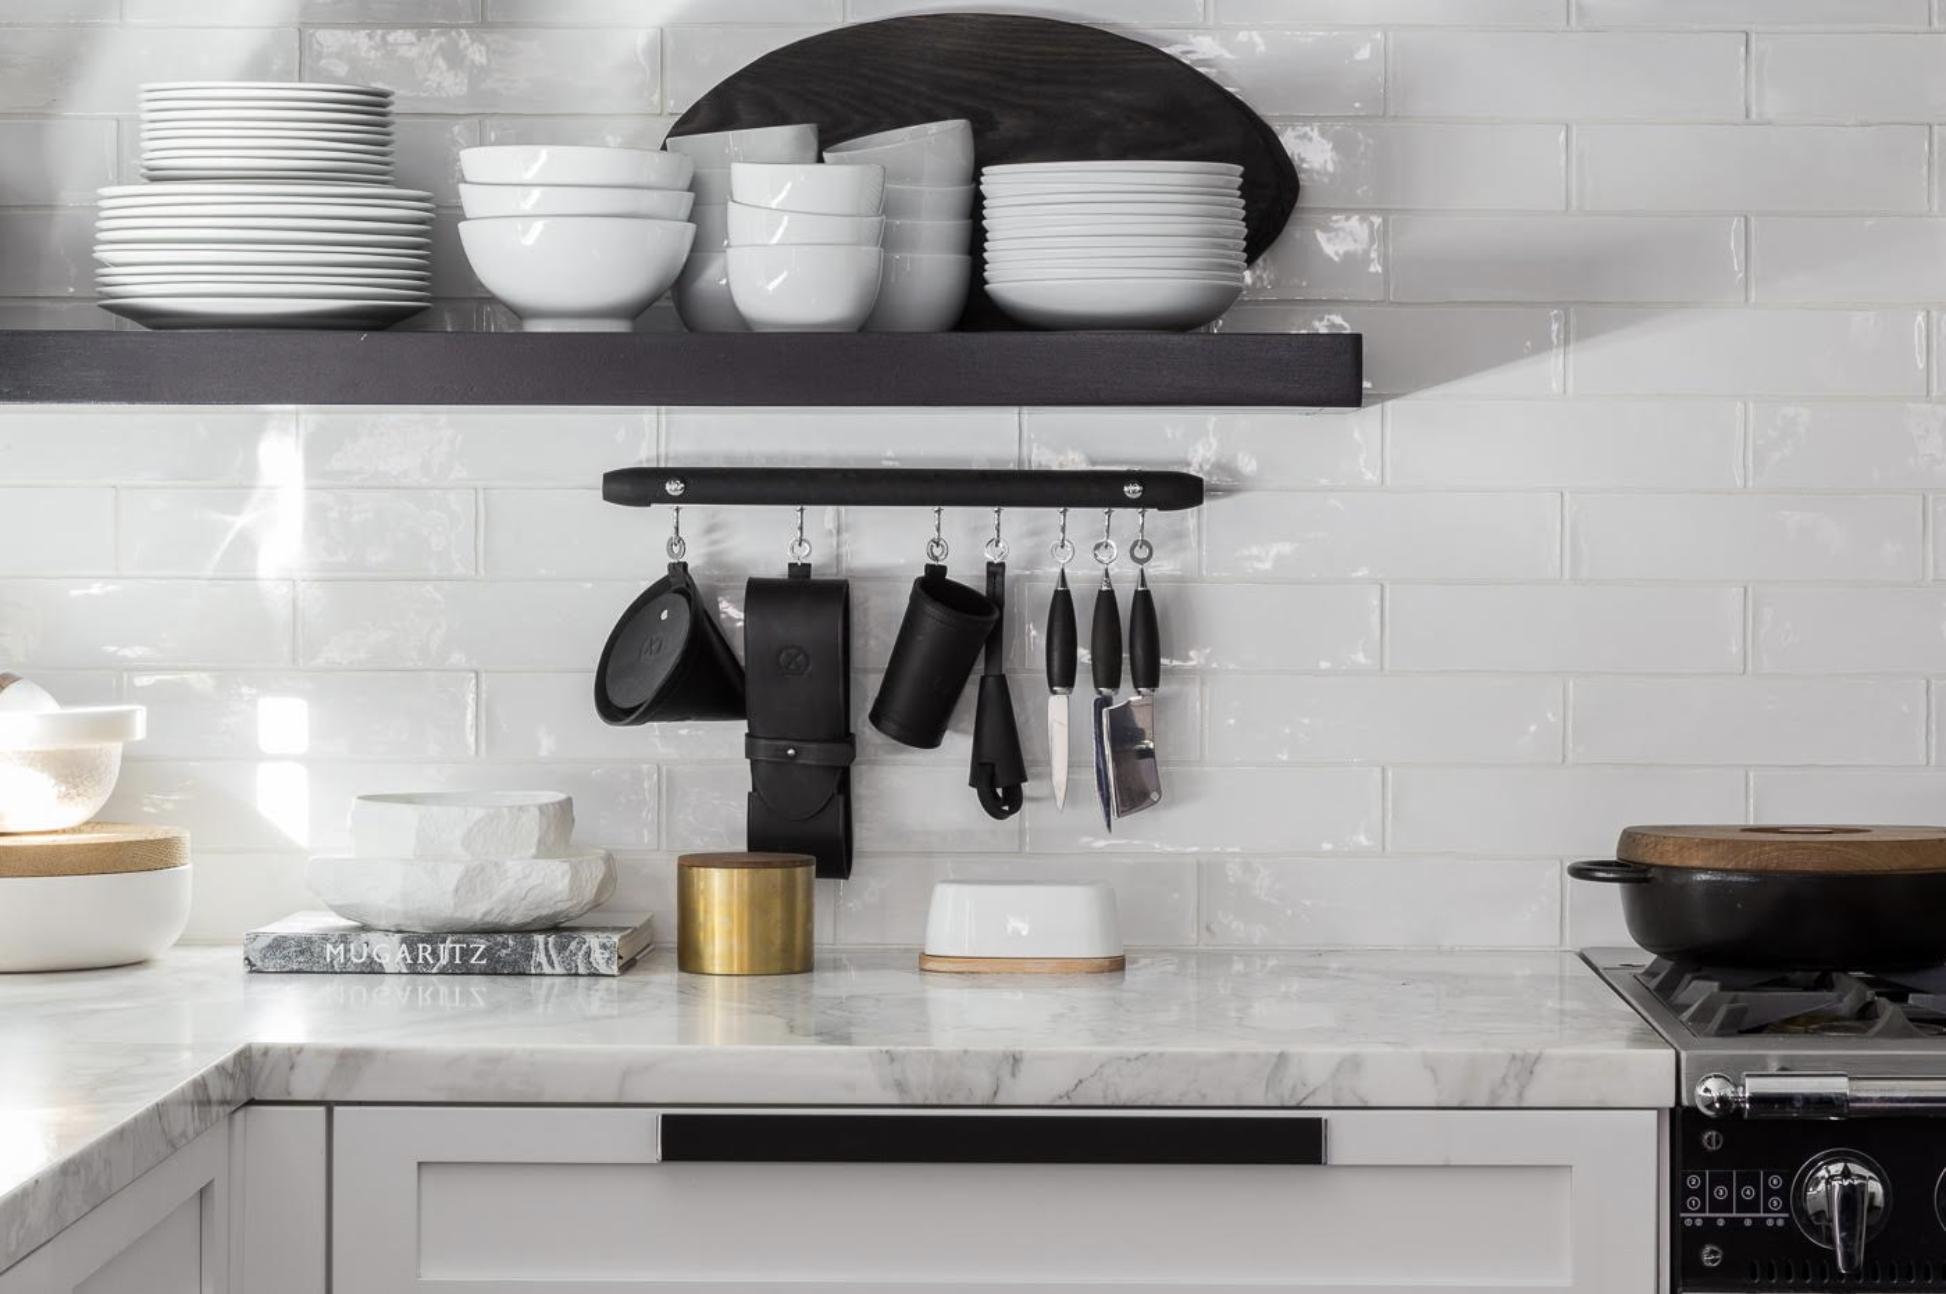 Kitchen Accessories Style Tile Surface Art Home Decor